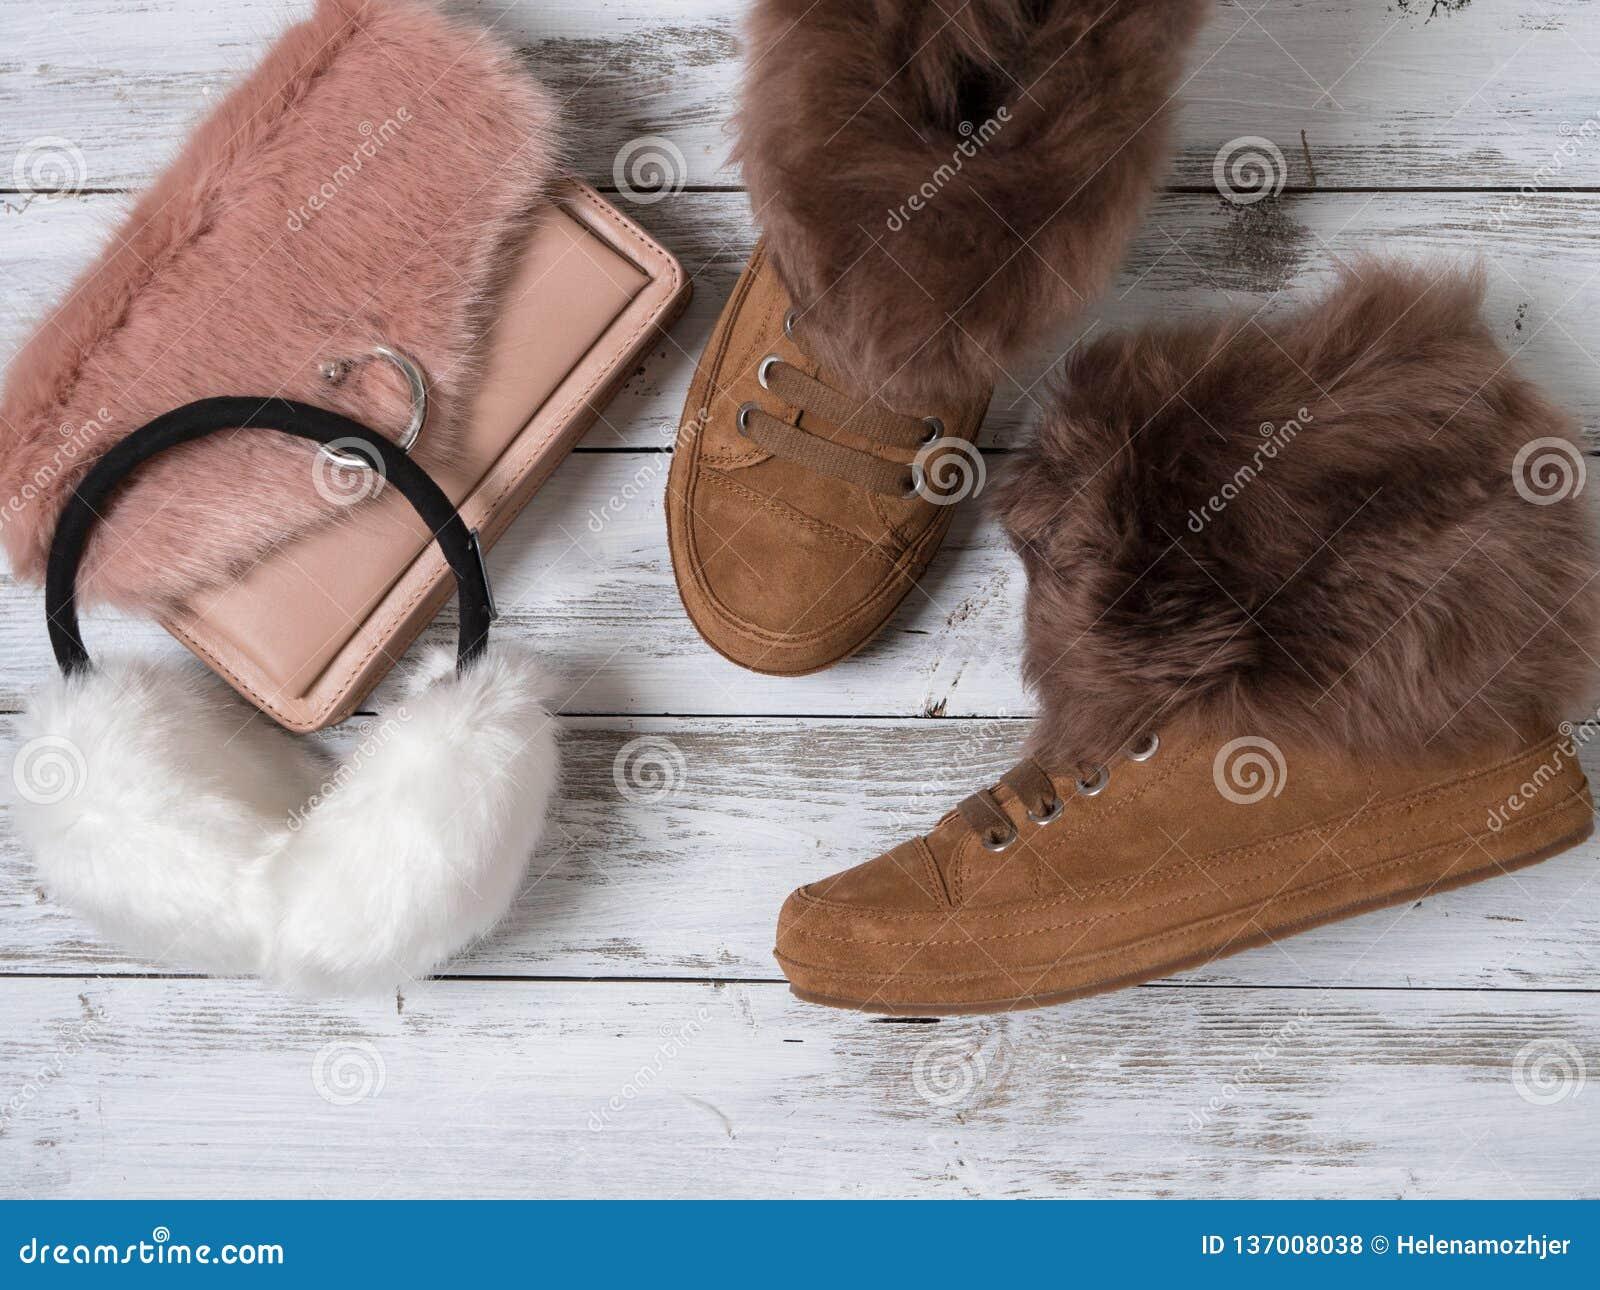 90c2d541f3 Womens Fashion Accessories